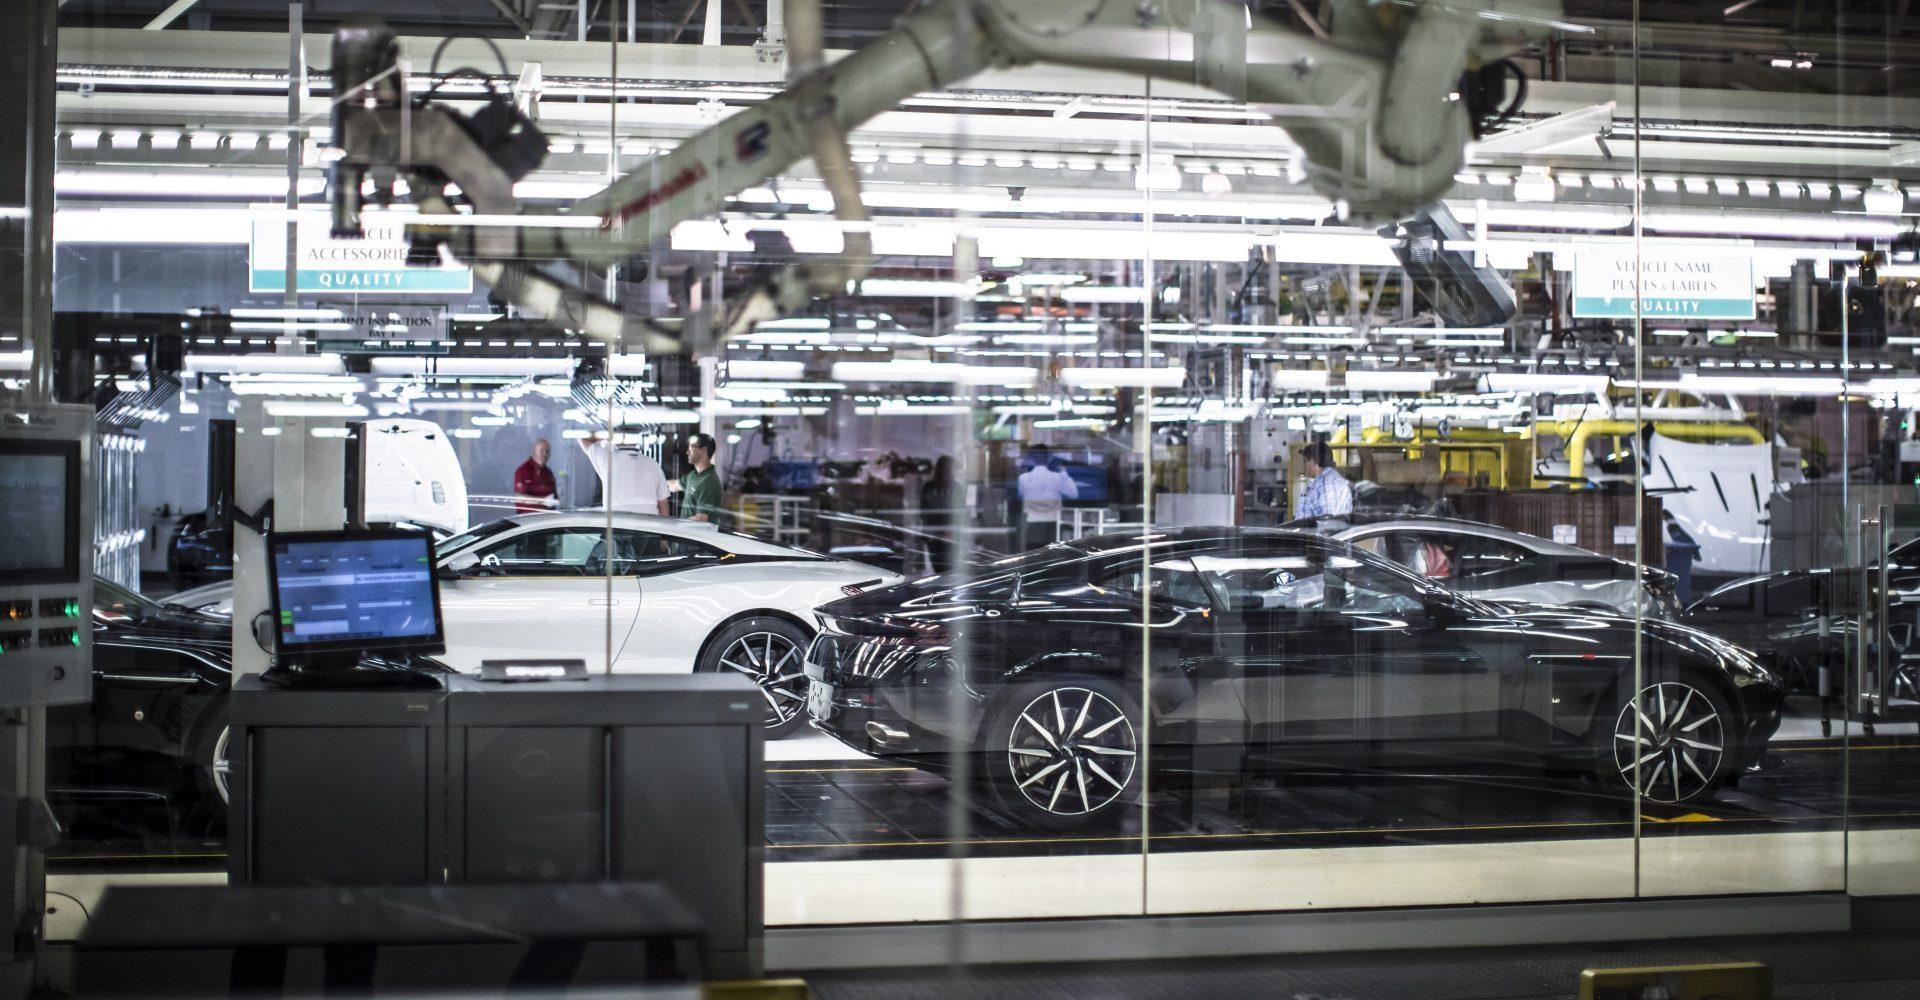 Coronavirus: Aston Martin suspends manufacturing following UK lockdown order